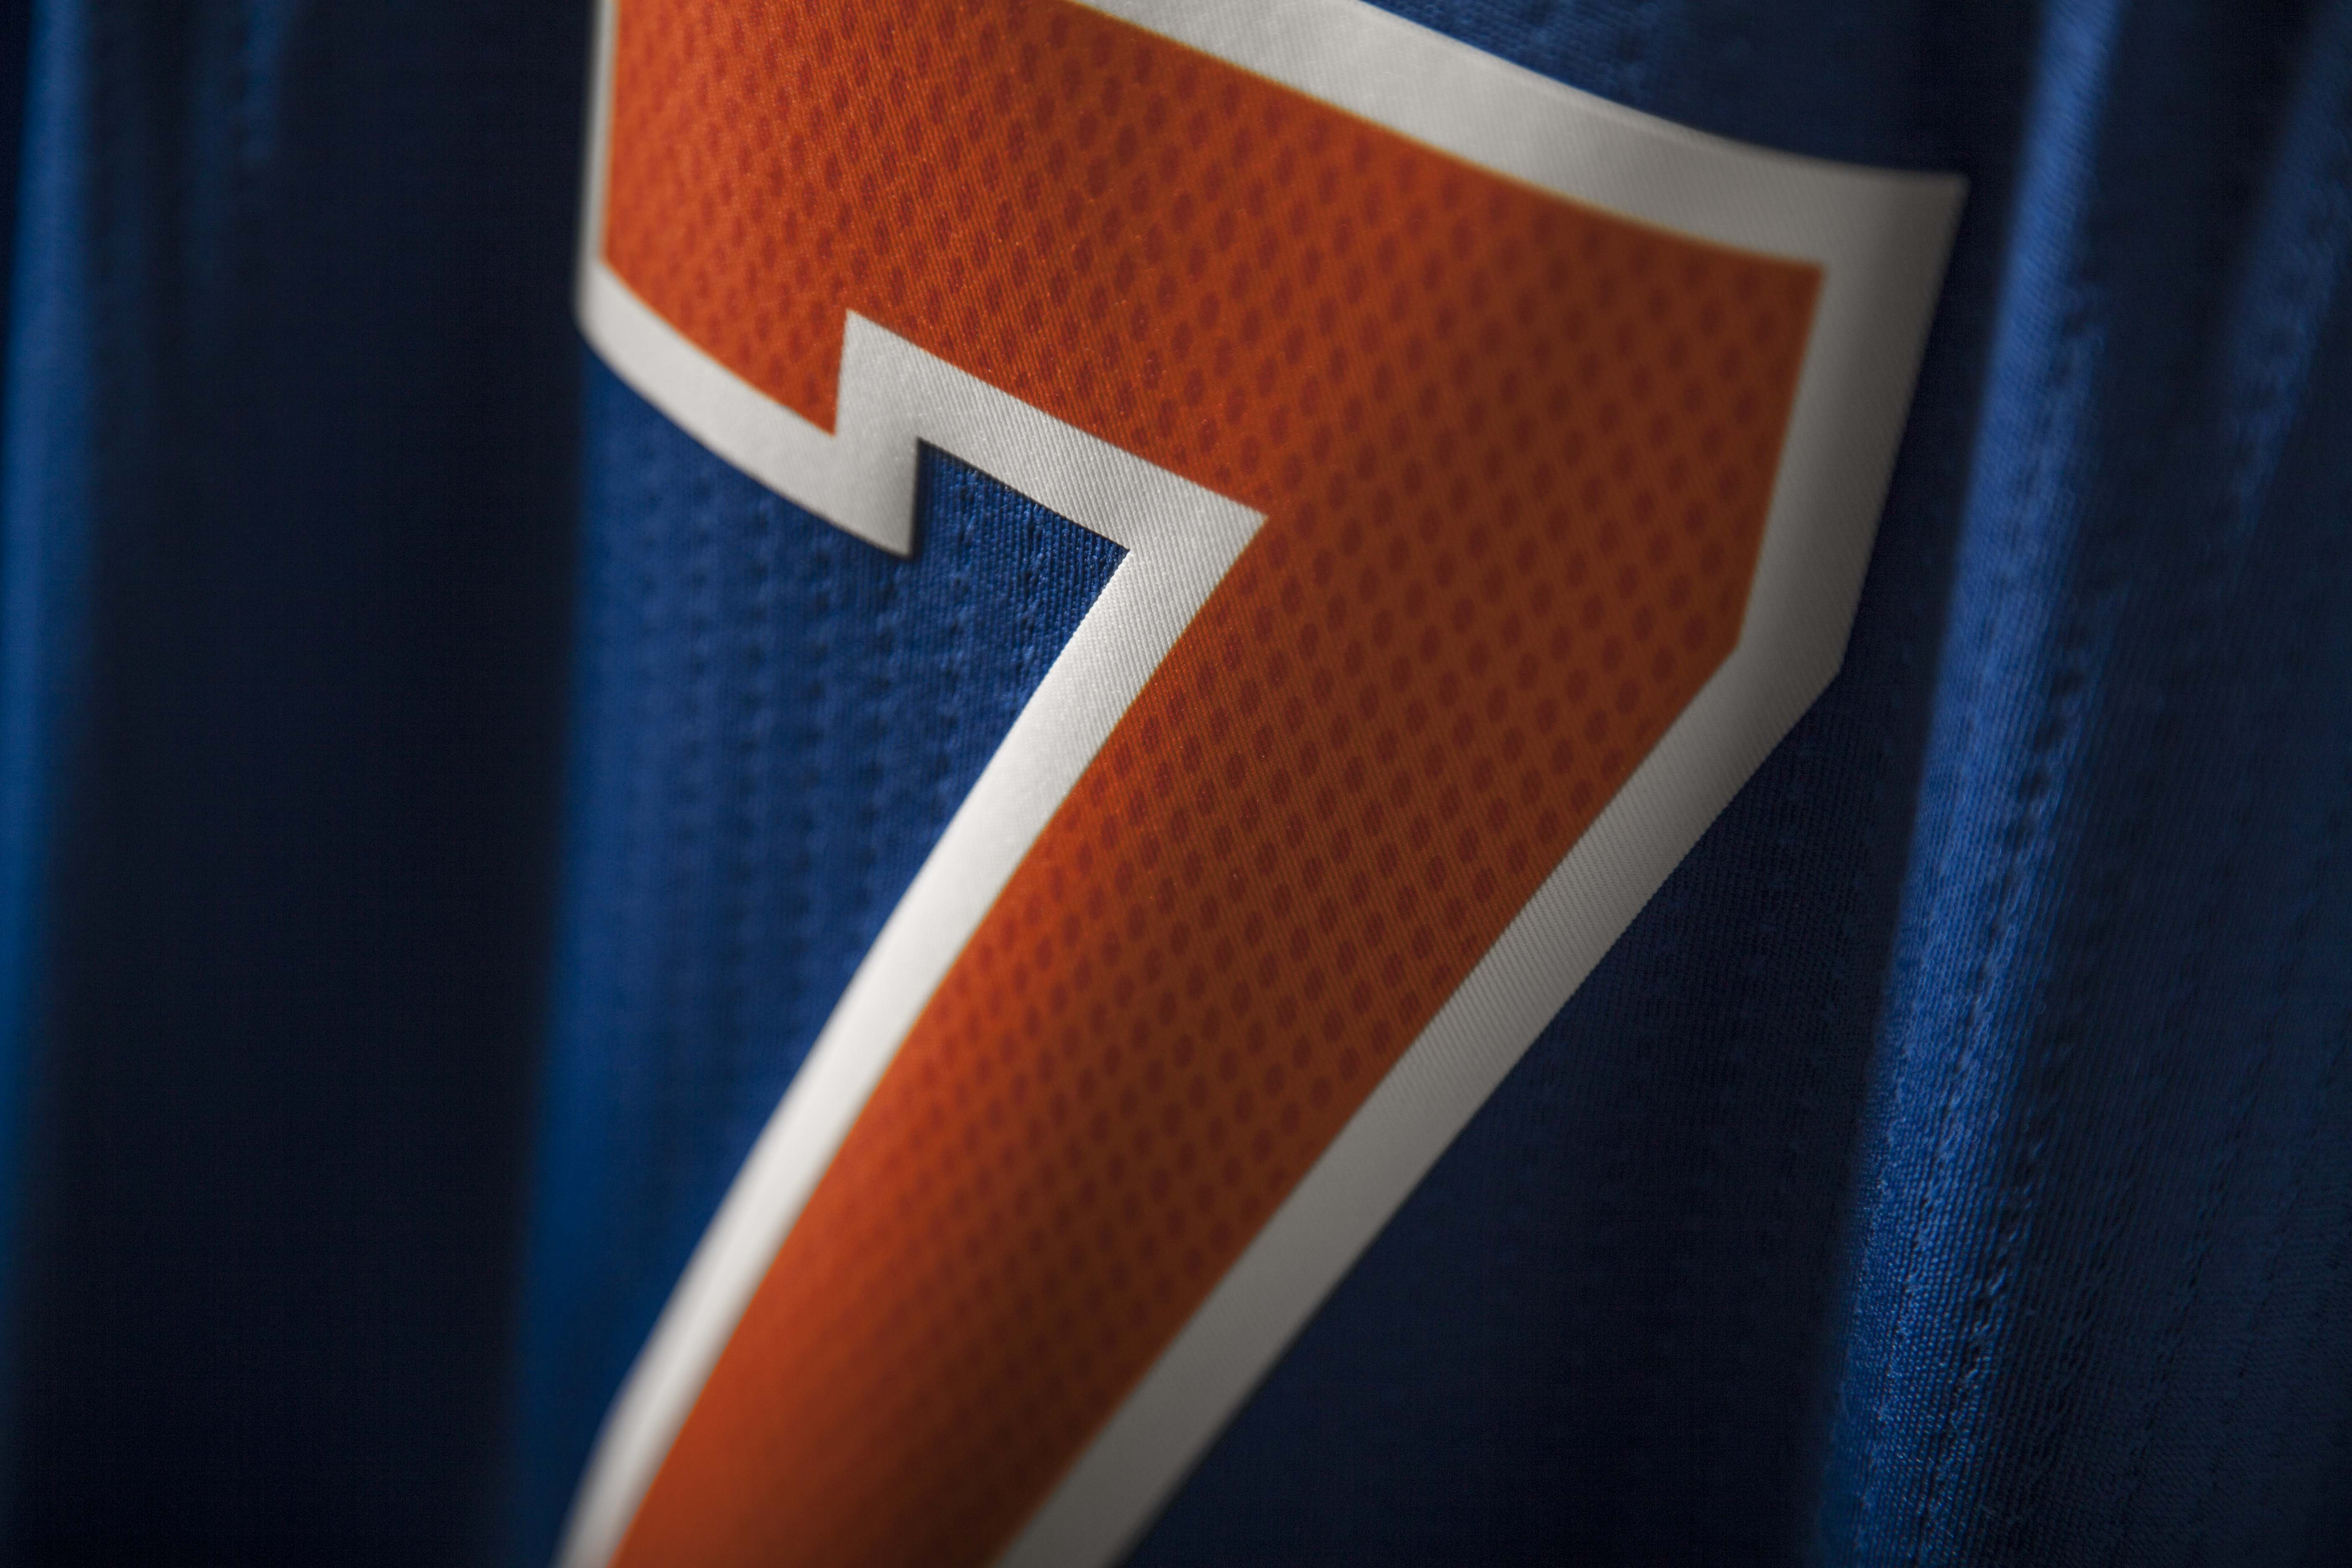 FW14_NBA_Jerseys_Knicks_Detail3